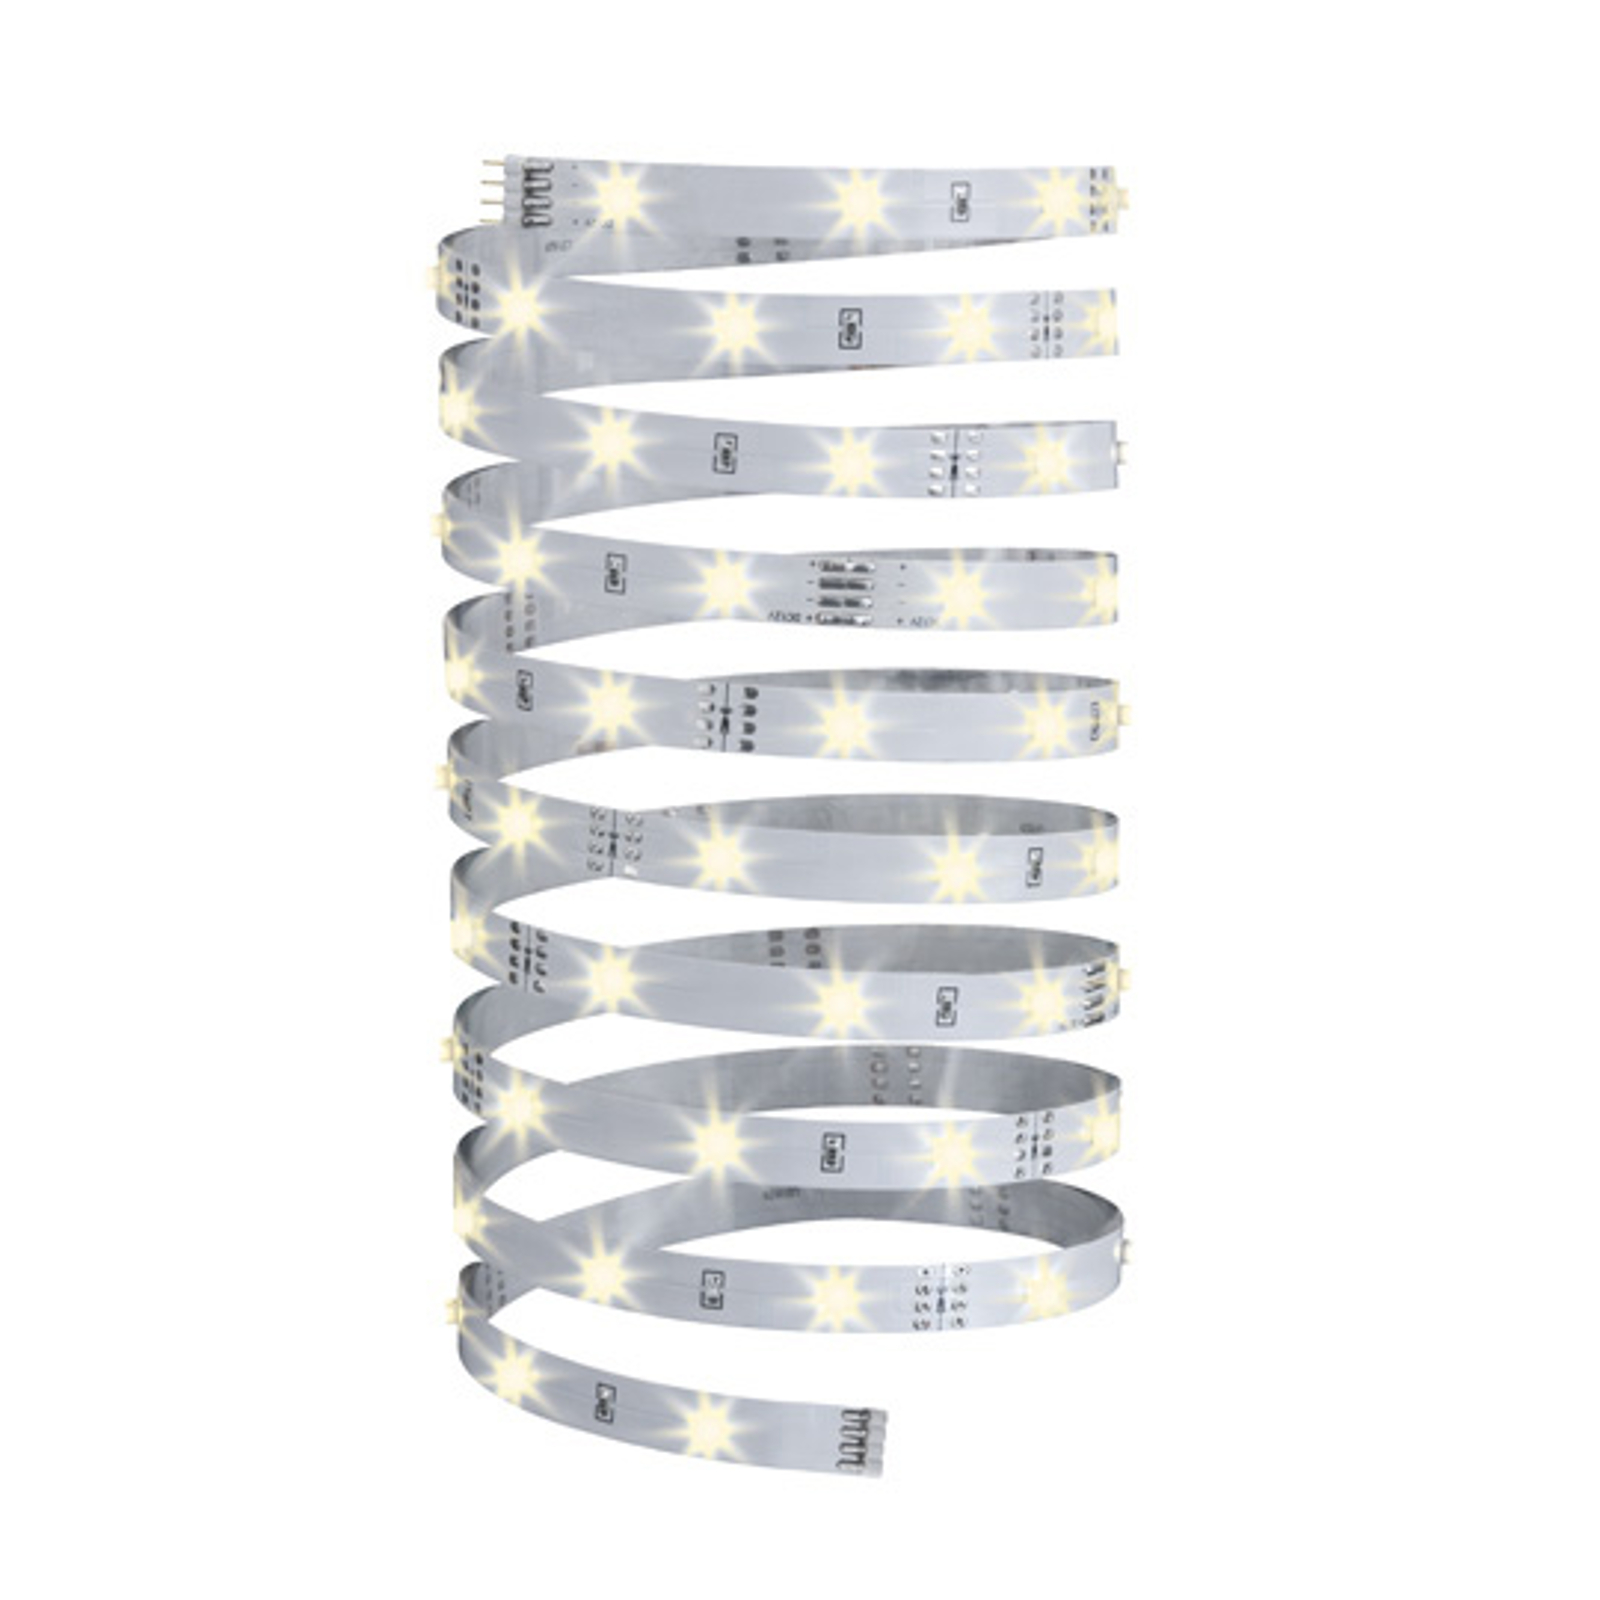 Paulmann YourLED Eco LED-Strip, 5m weiß warmweiß